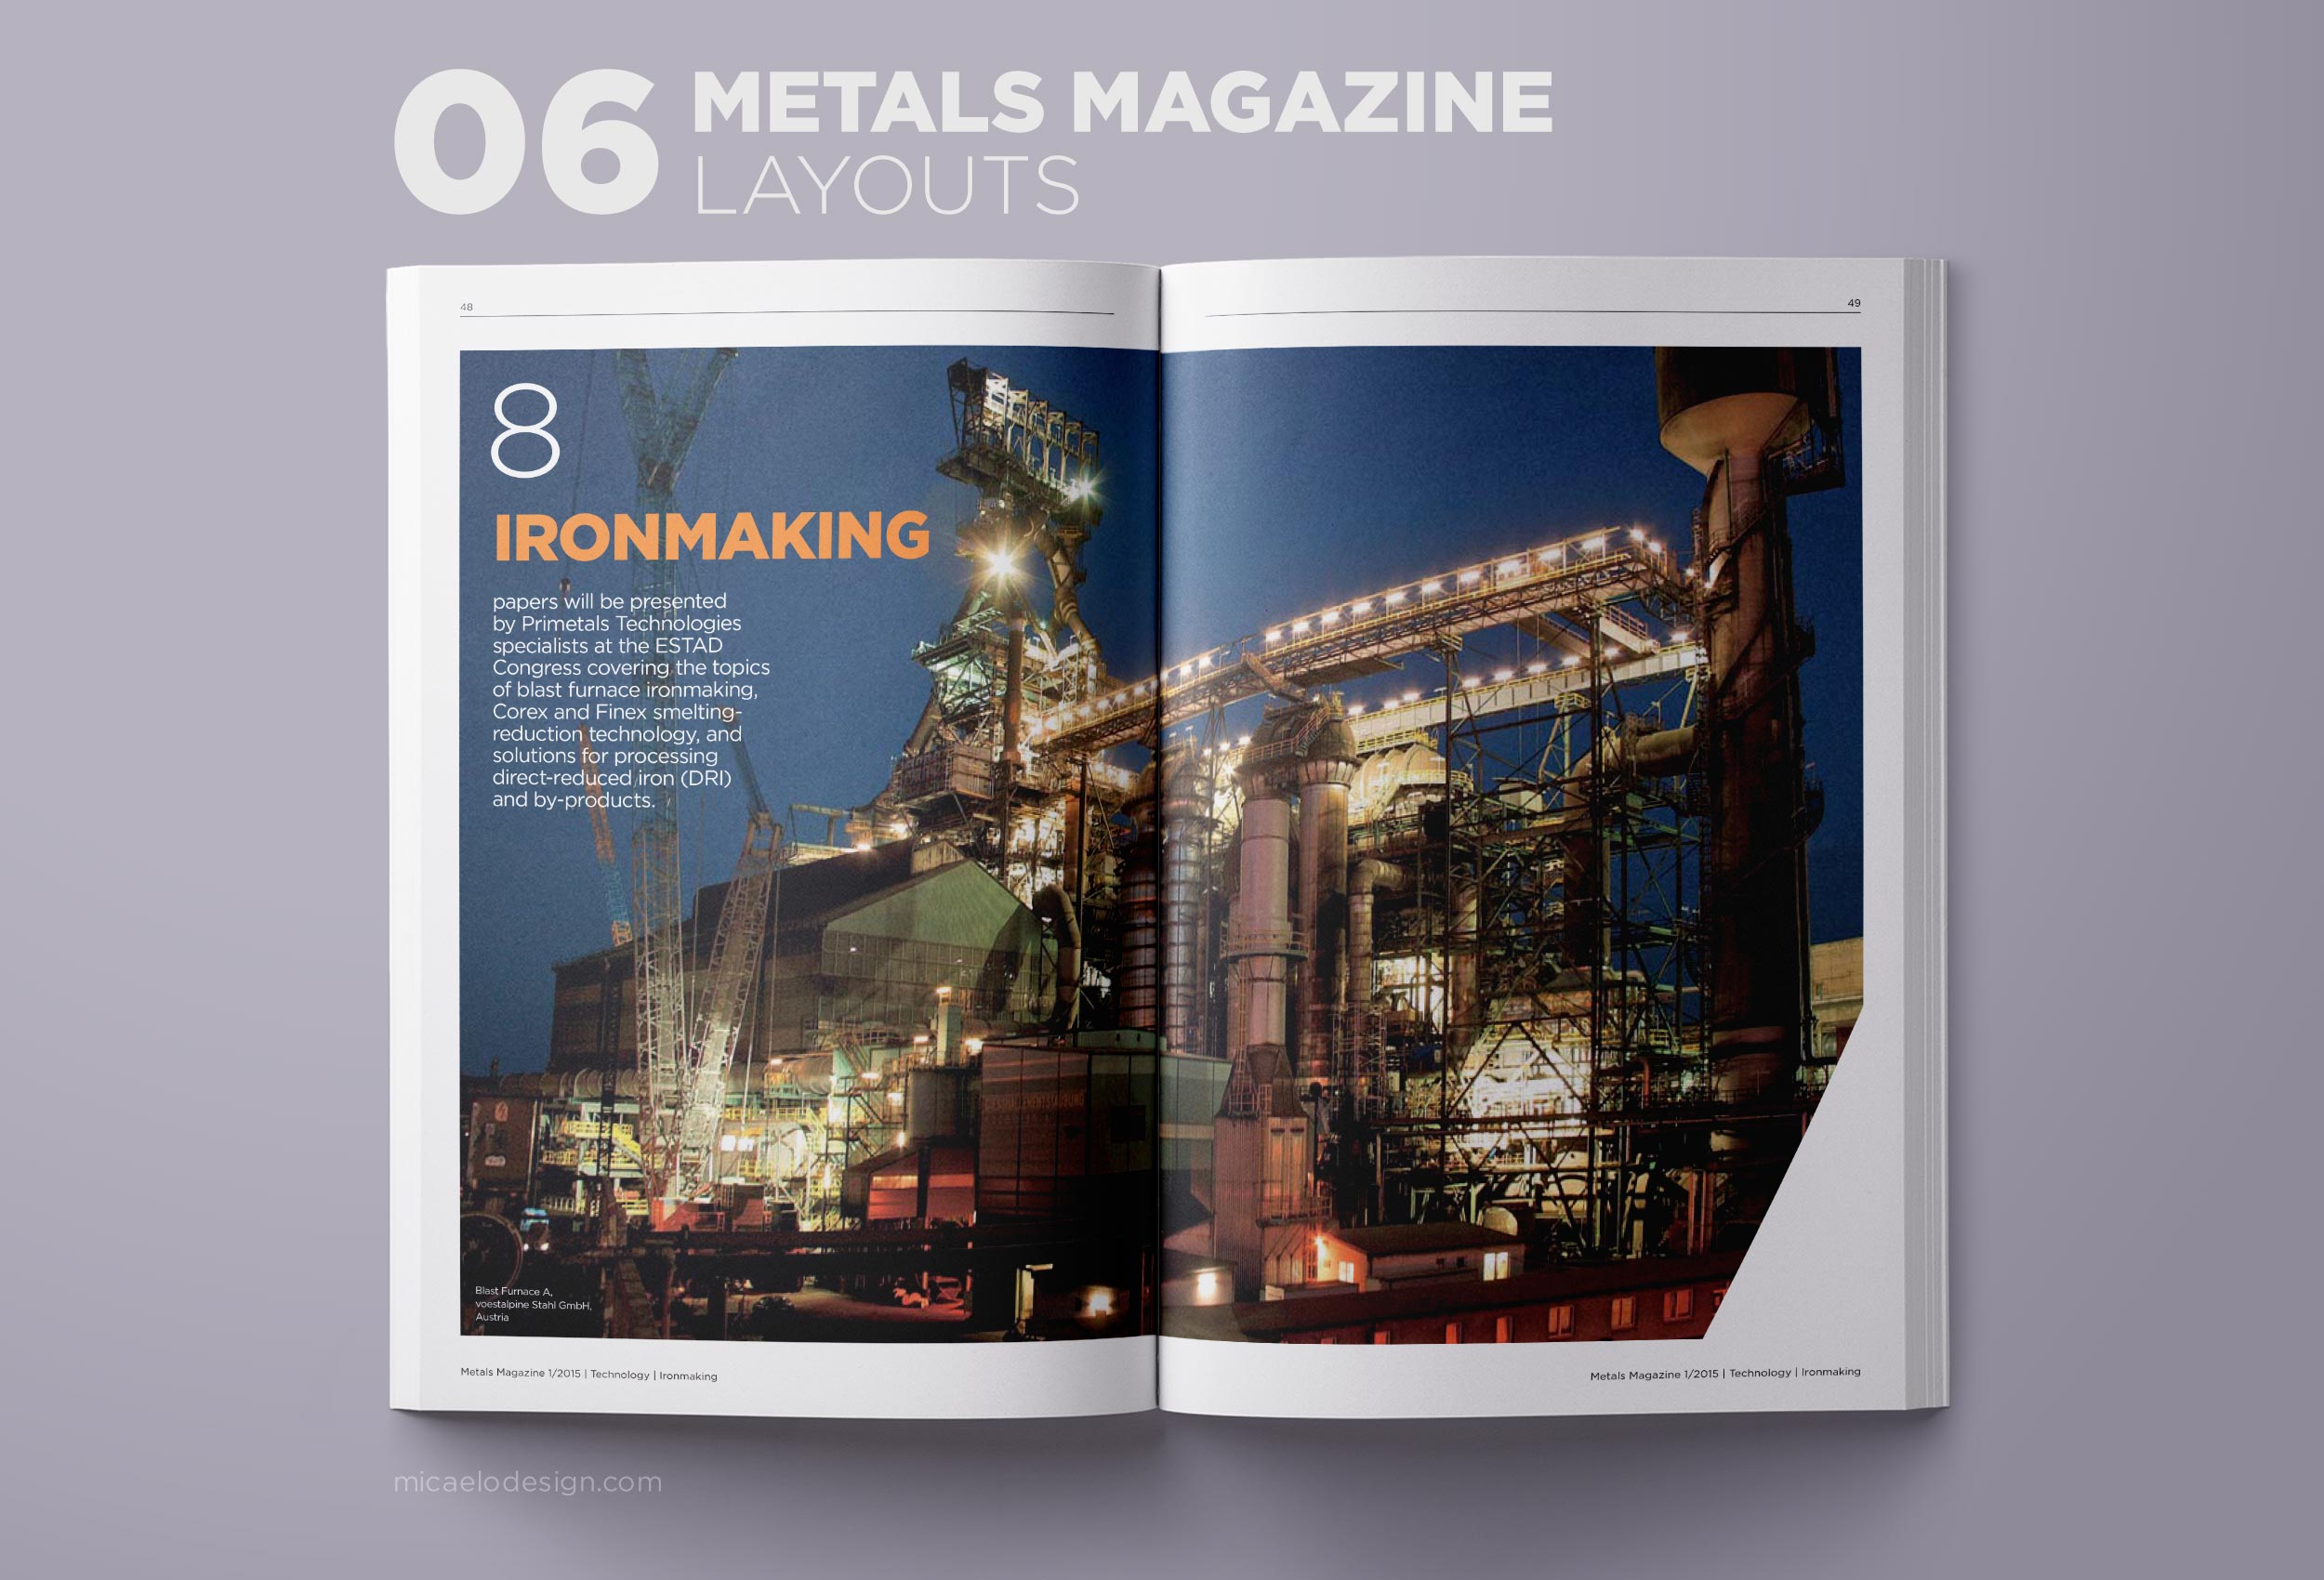 Primetals Metals Magazine layout N06